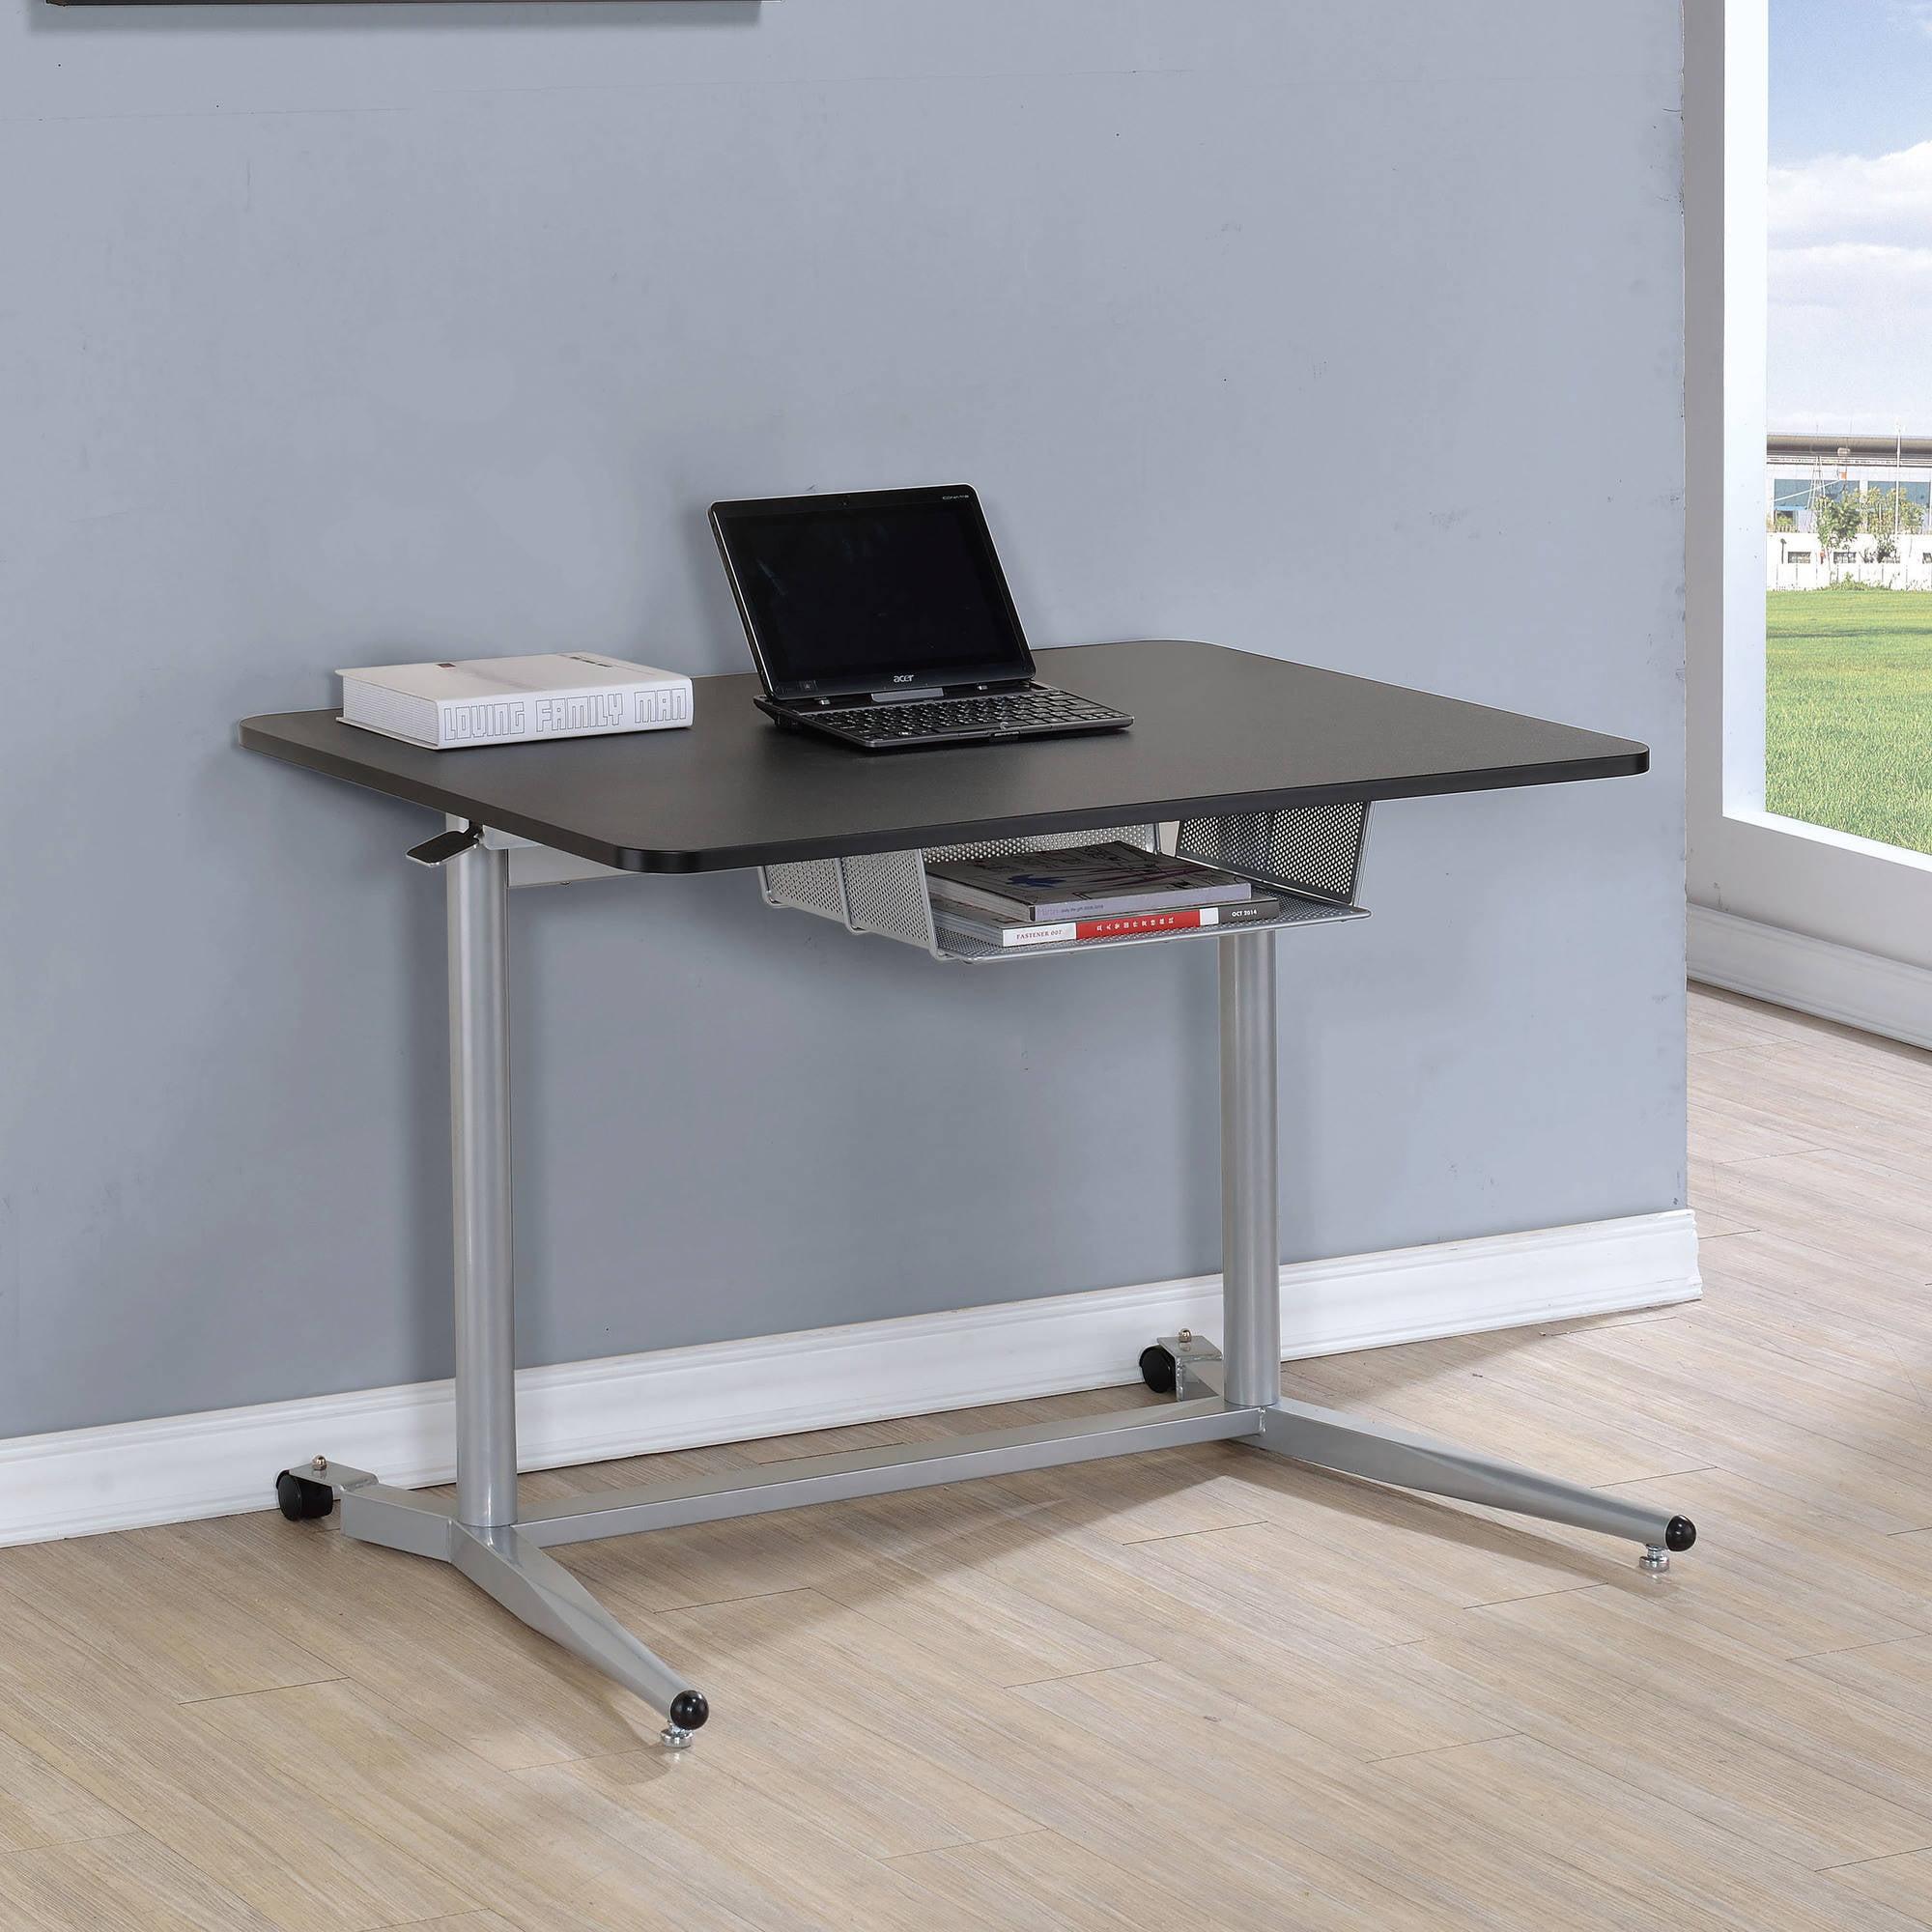 Coaster Adjustable Desk in Black and Silver